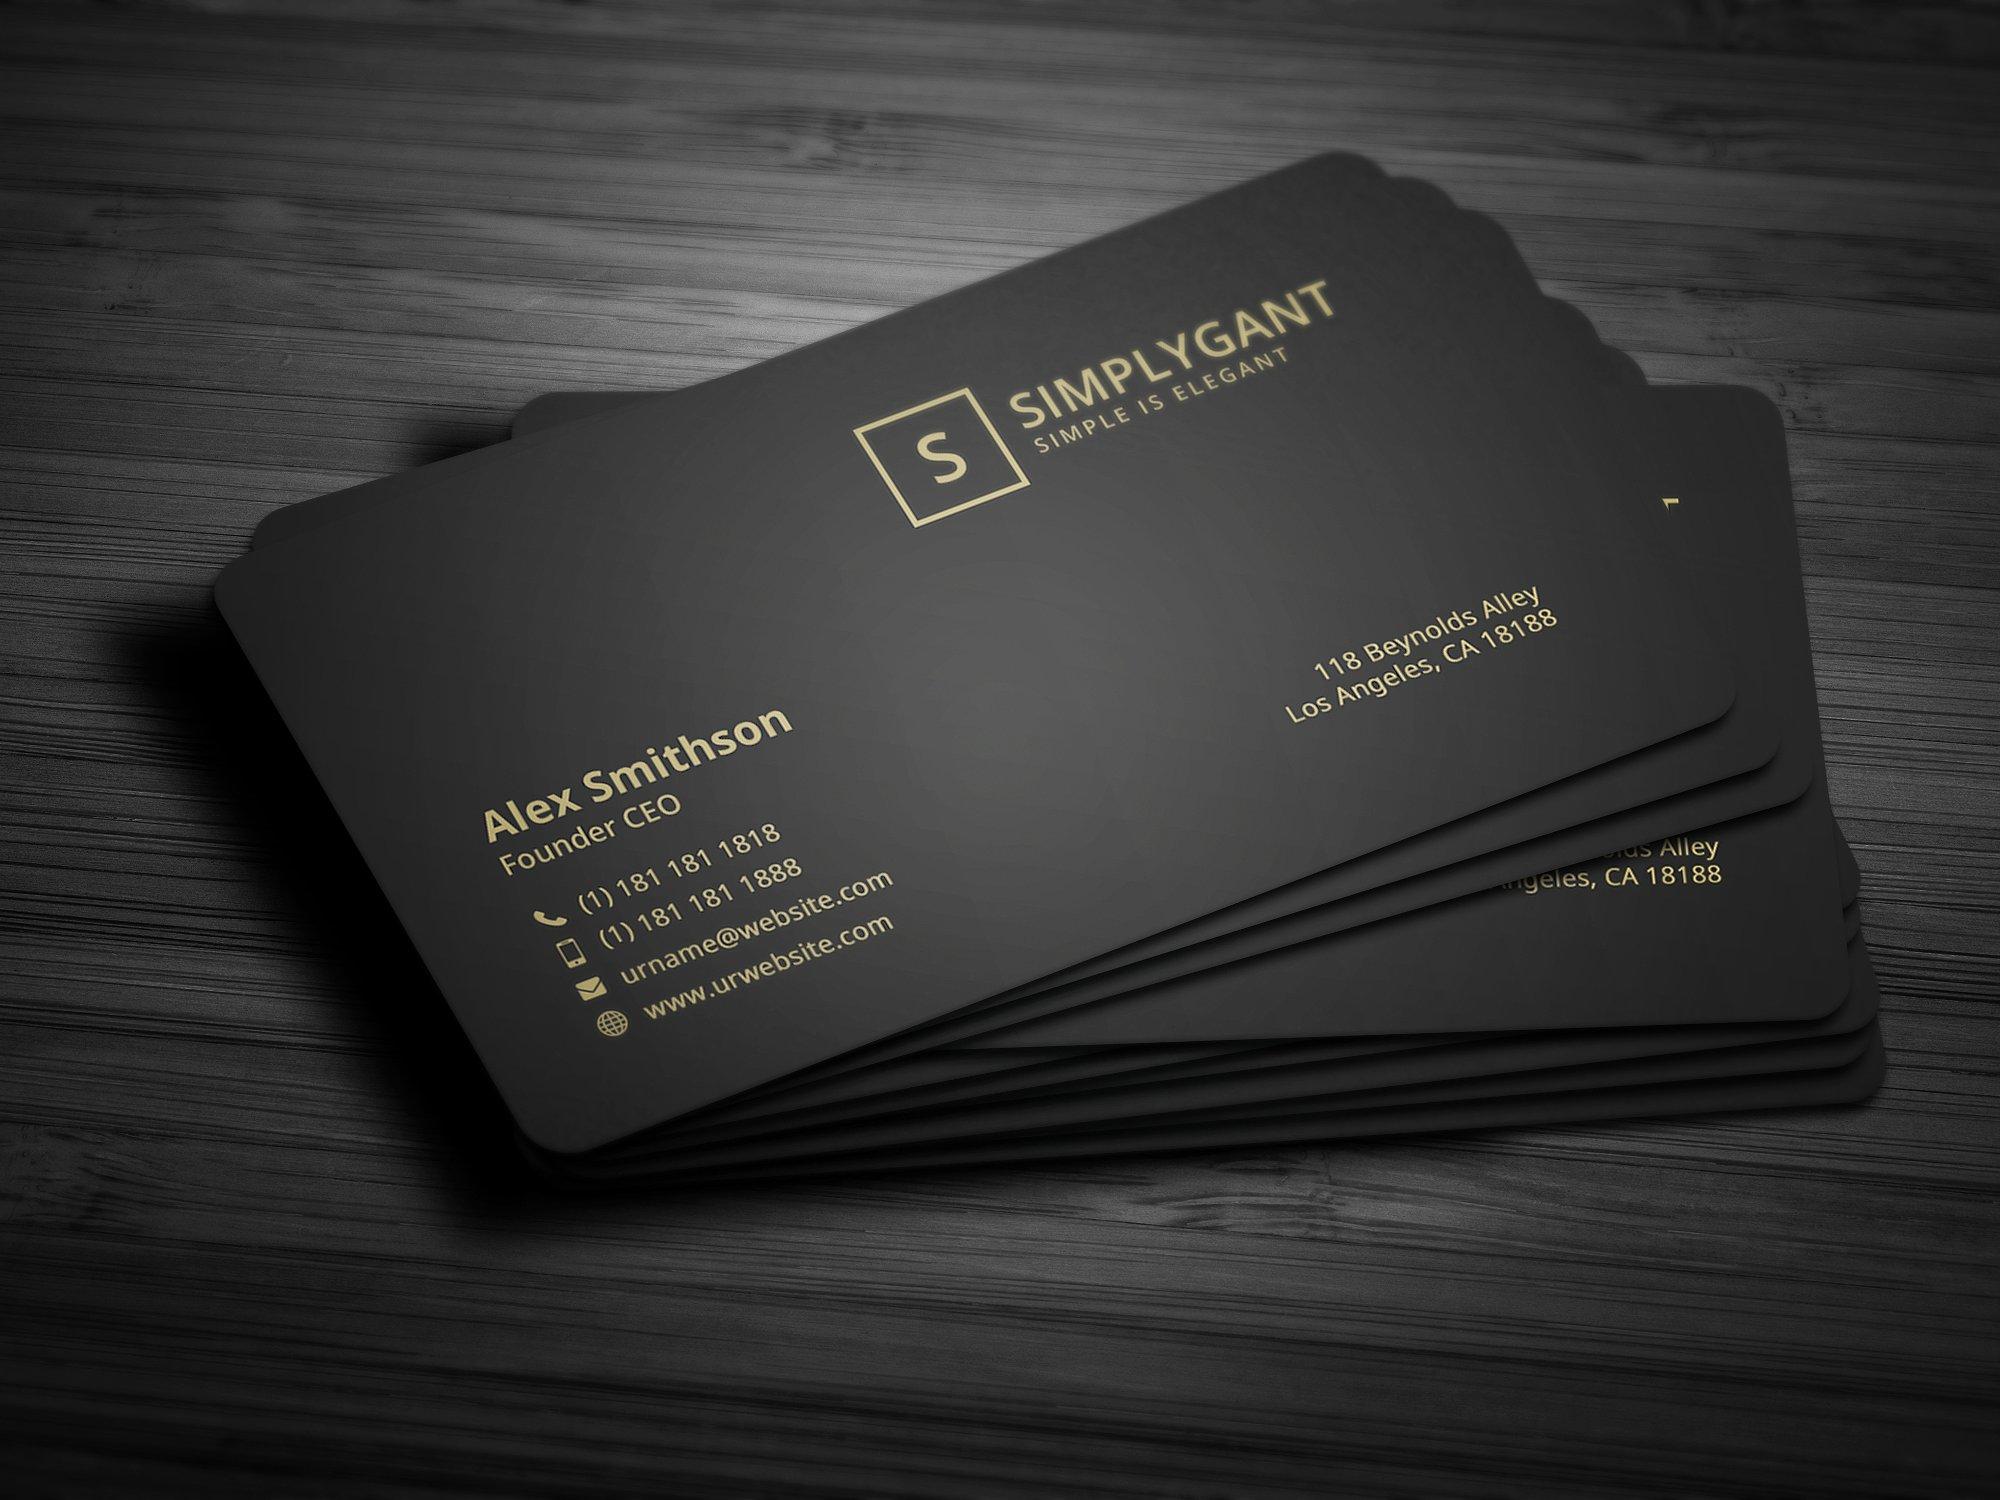 i card samples for business